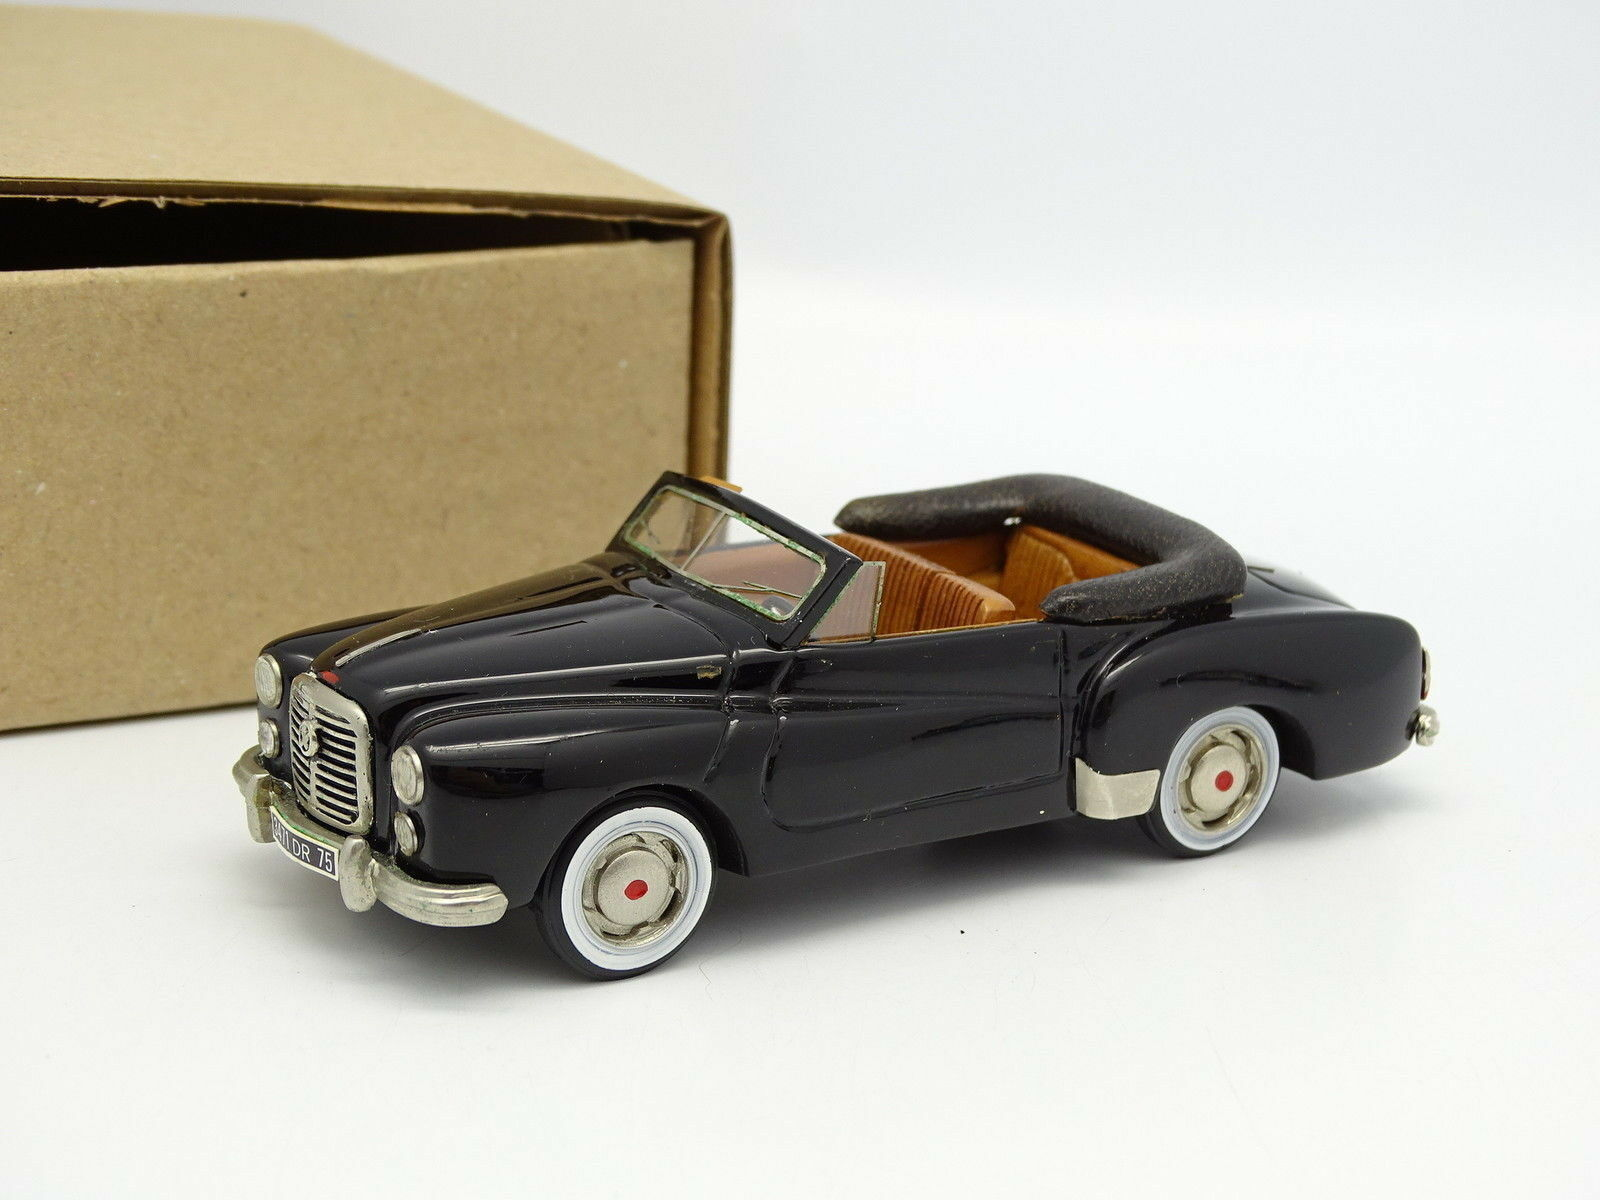 Ma Collection Brianza Résine 1 43 - Hotchkiss Gregoire Cabriolet schwarze